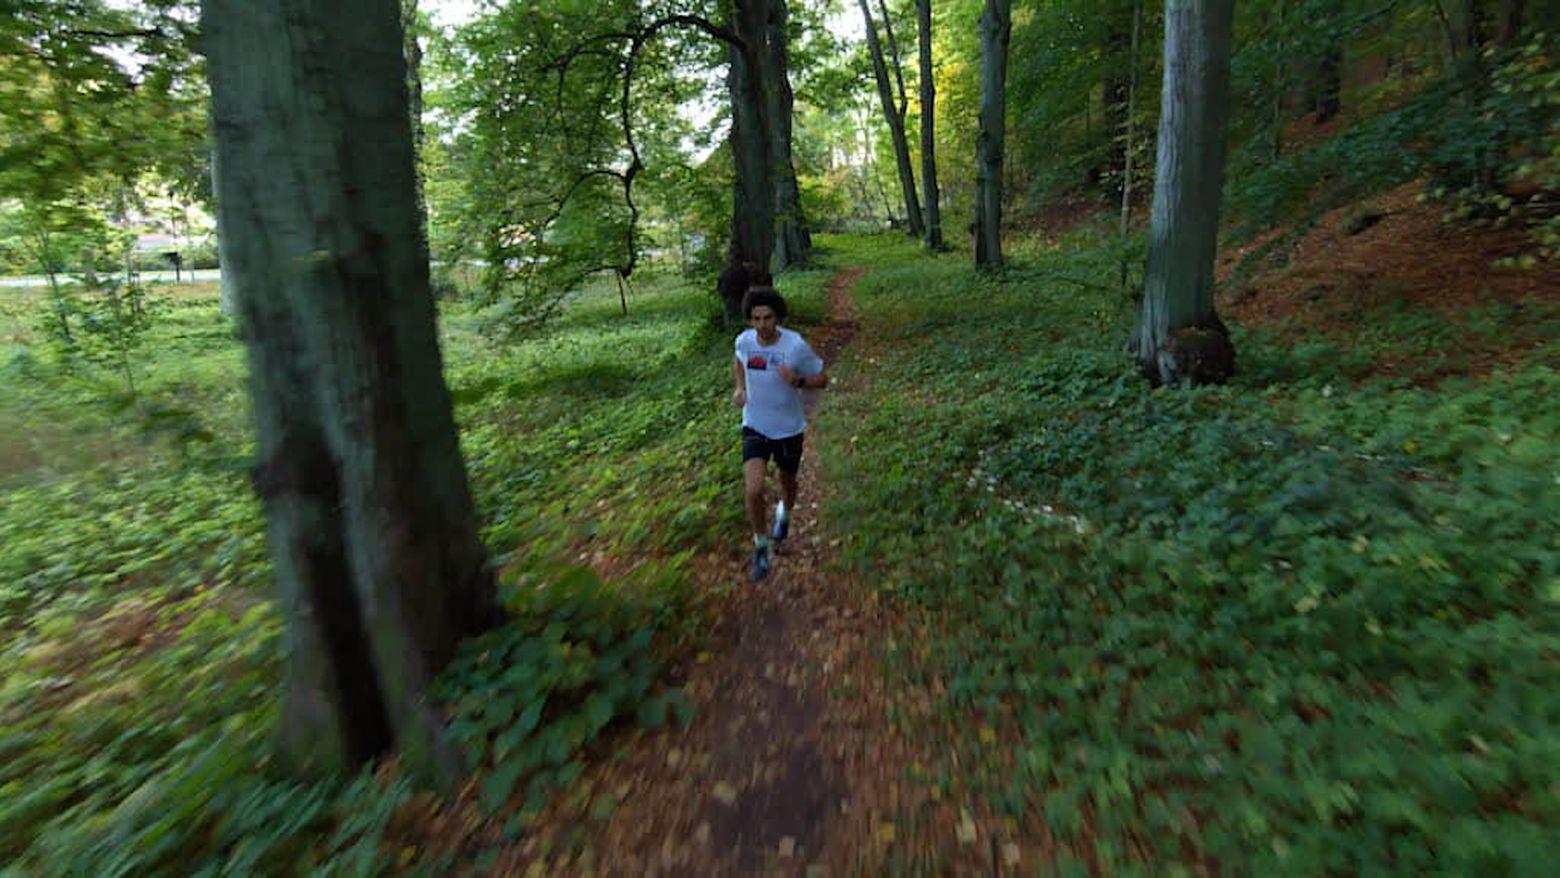 Alexander Holmblad running with Skydio 2